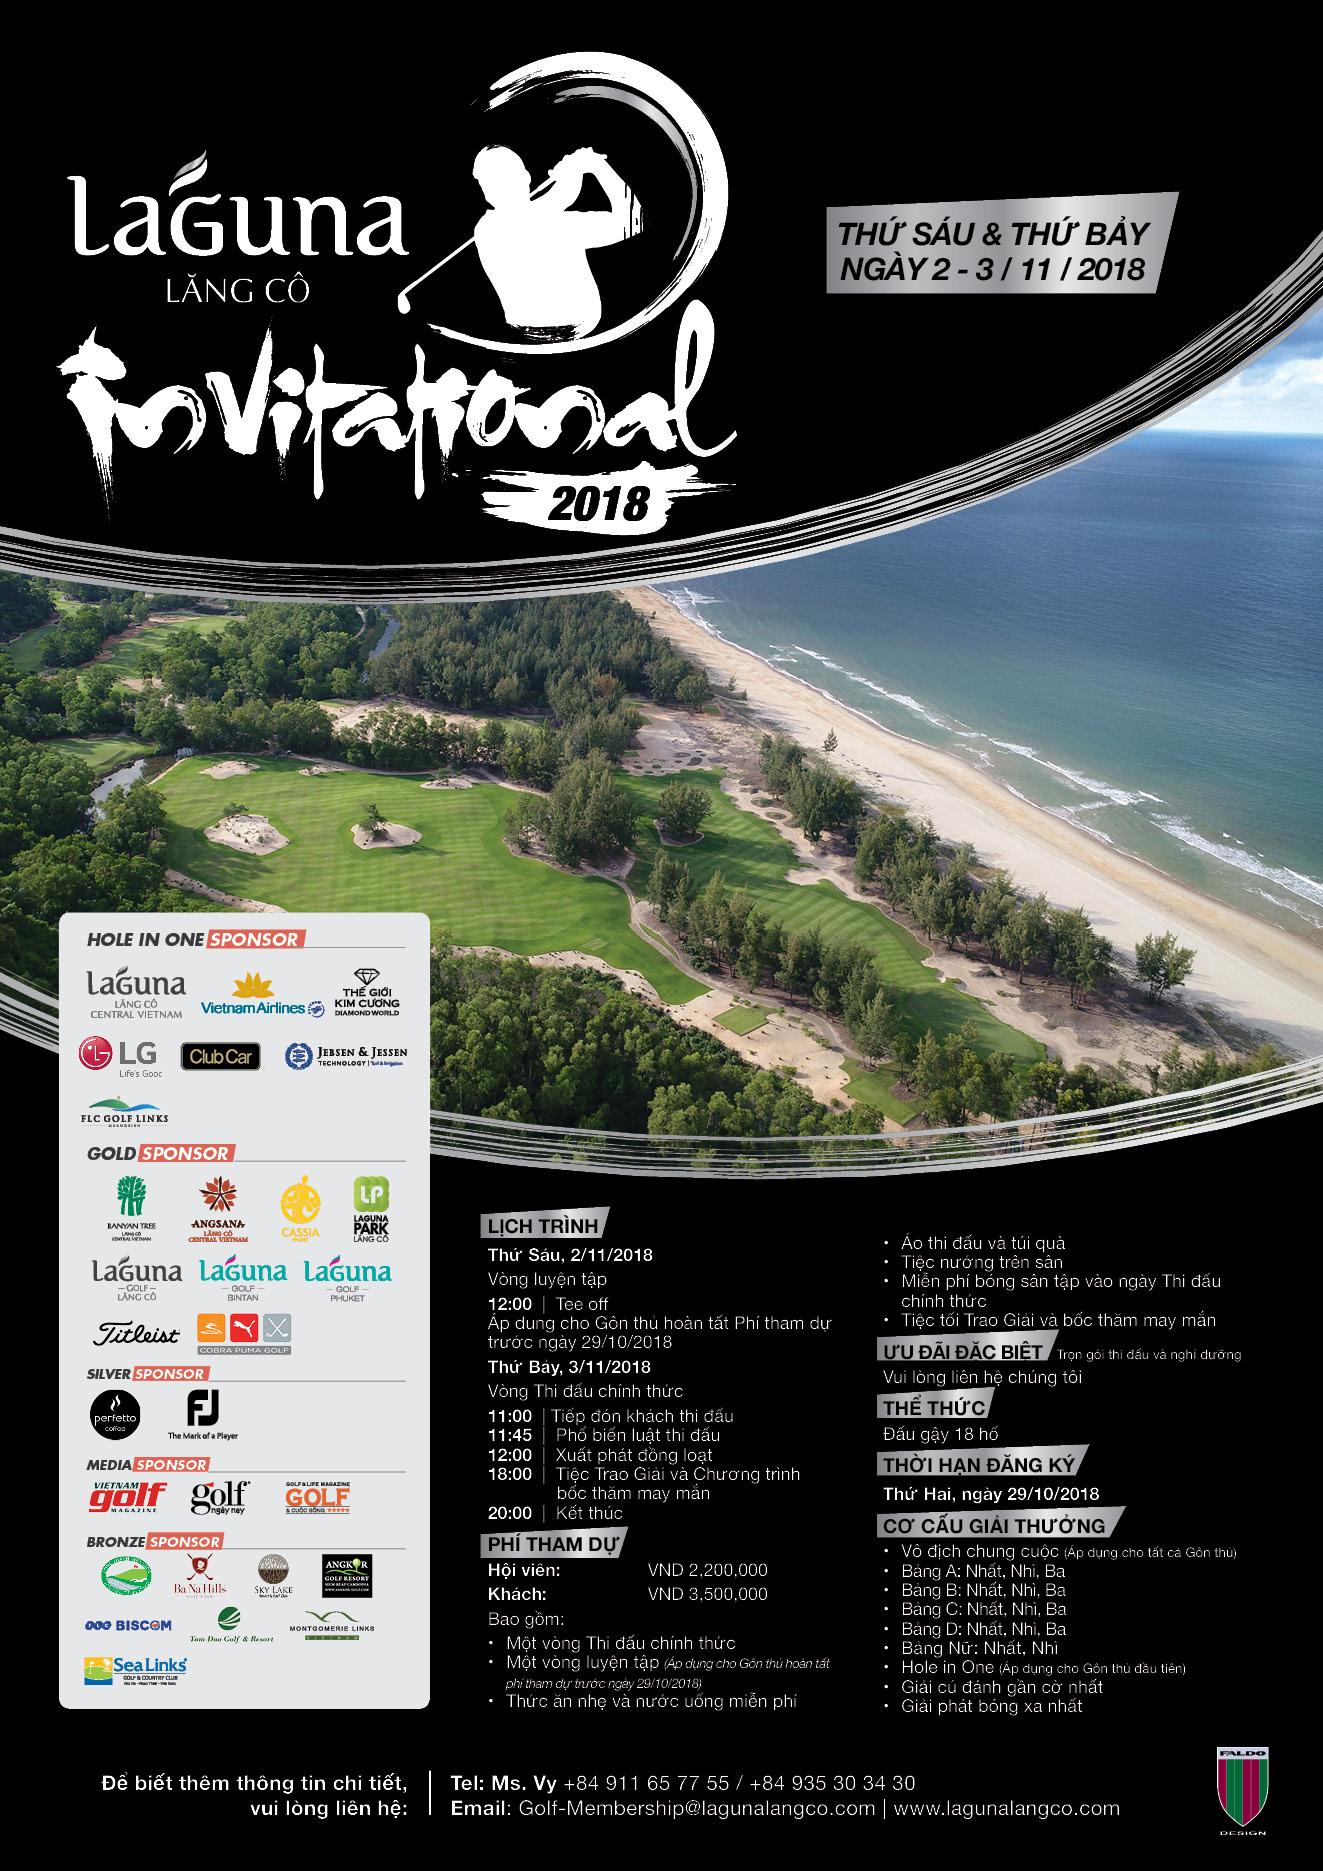 Giải đấu Laguna Lăng Cô Invitational 2018